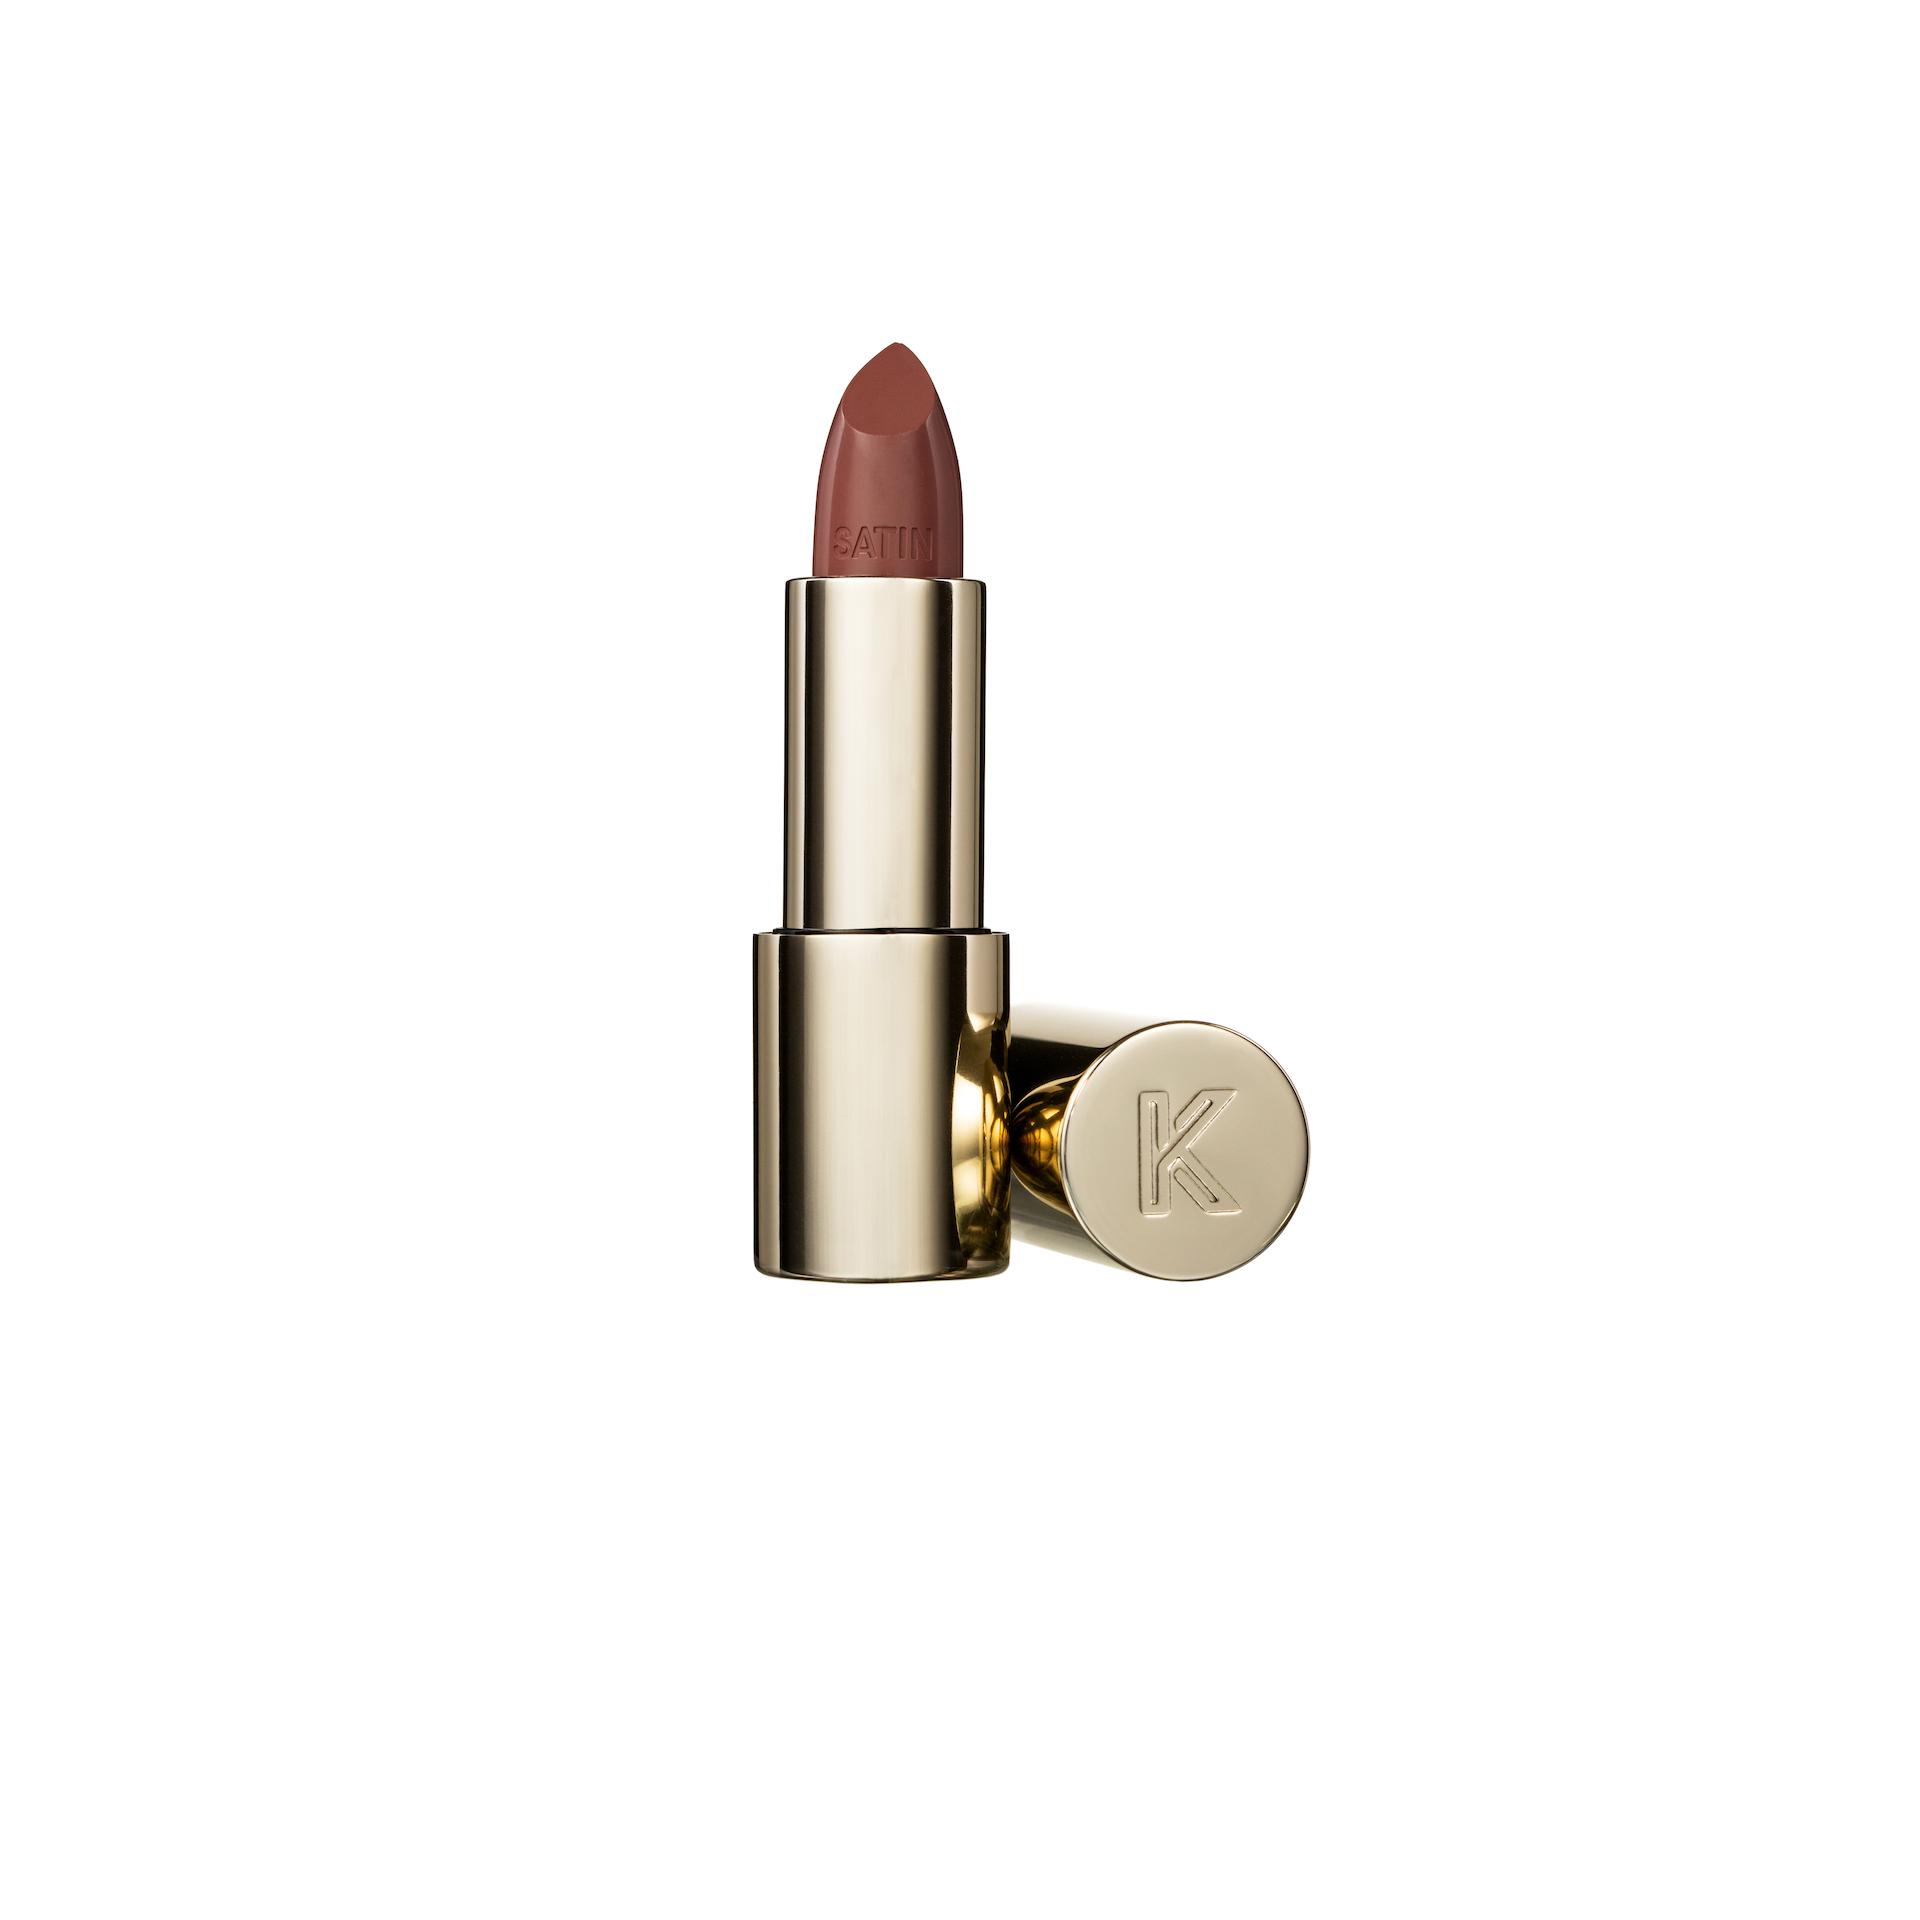 Satin Lipstick 01 Creme Brulee